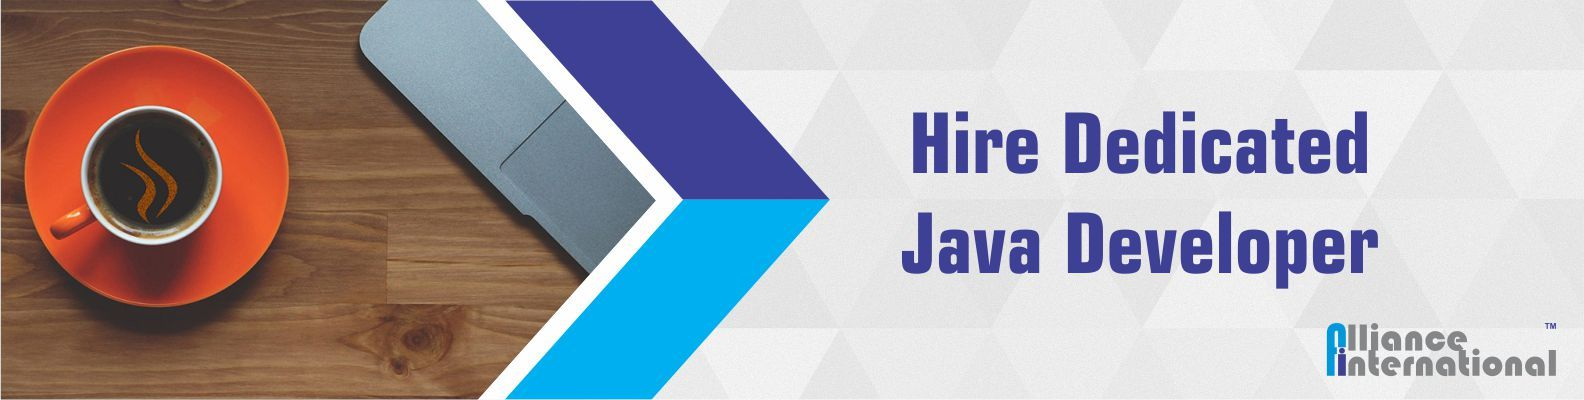 Hire Dedicated Java Developer